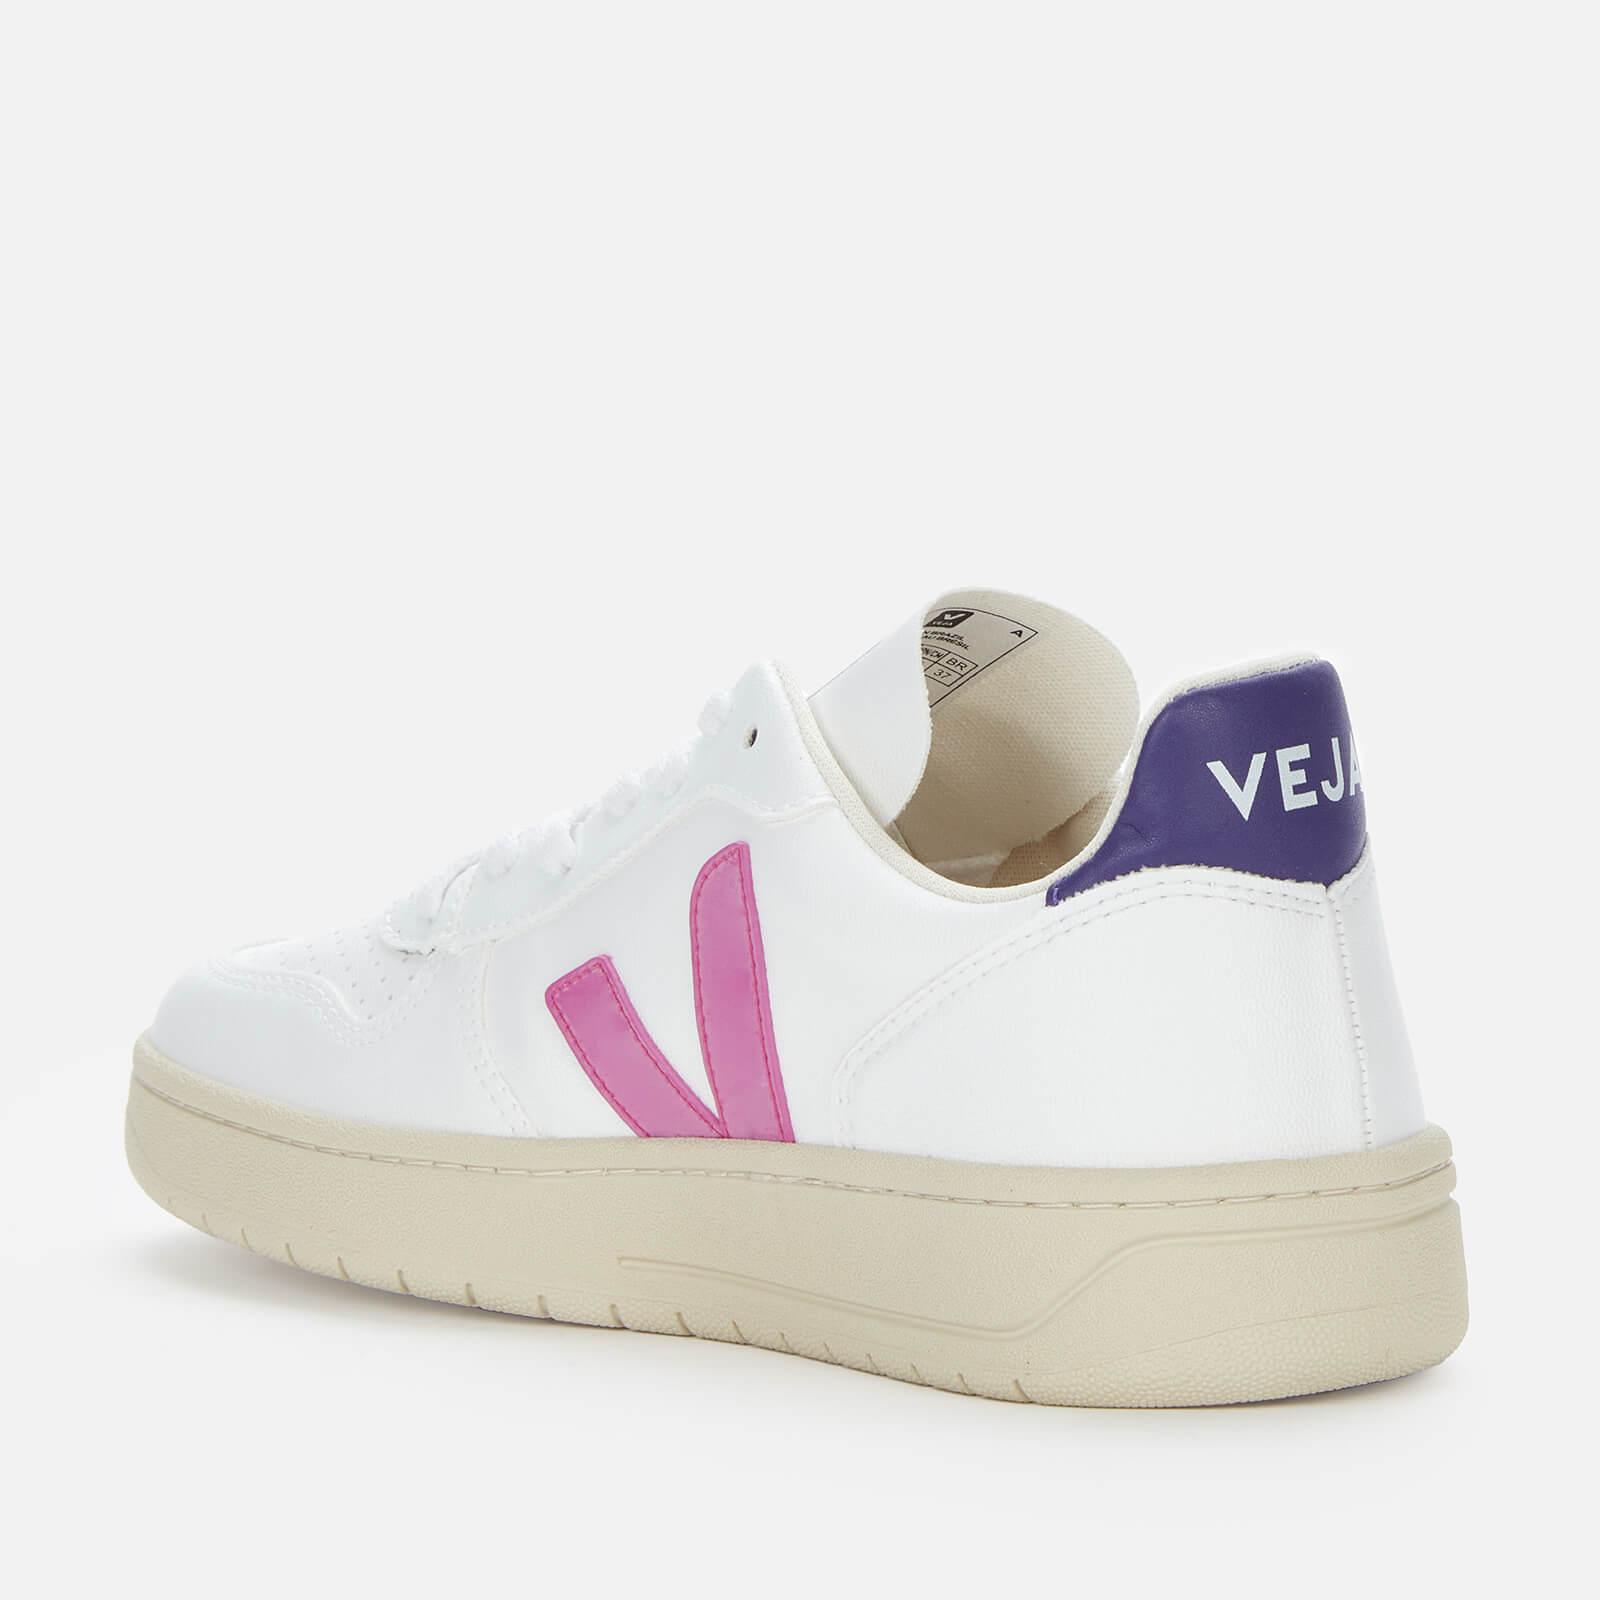 Veja Women's V10 Vegan Trainers - White/Ultraviolet Purple